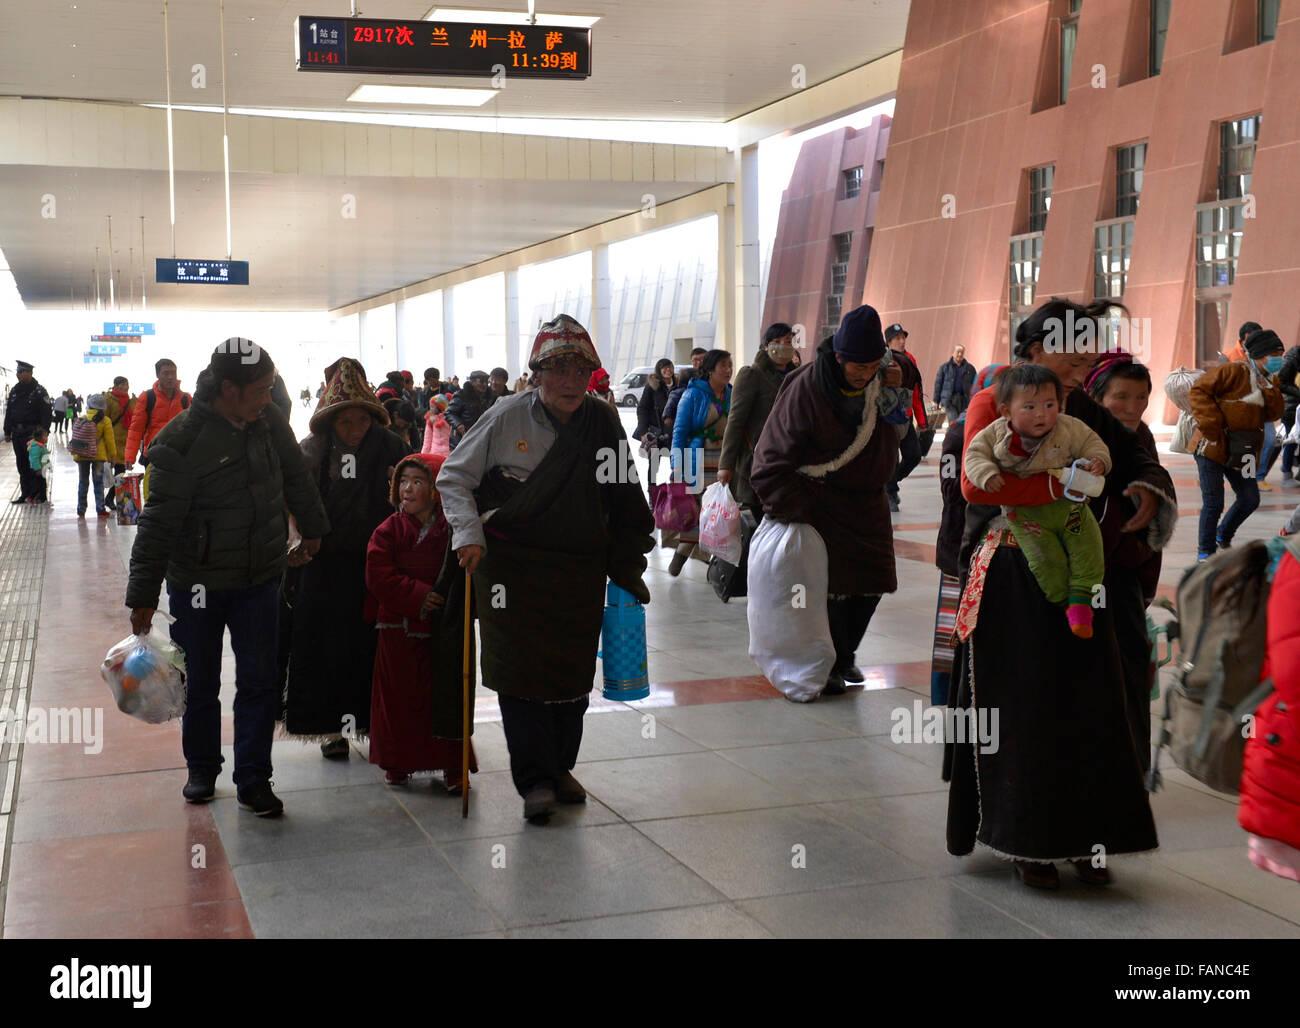 Lhasa, China's Tibet Autonomous Region. 2nd Jan, 2016. Passengers walk on the platform of a train station in - Stock Image